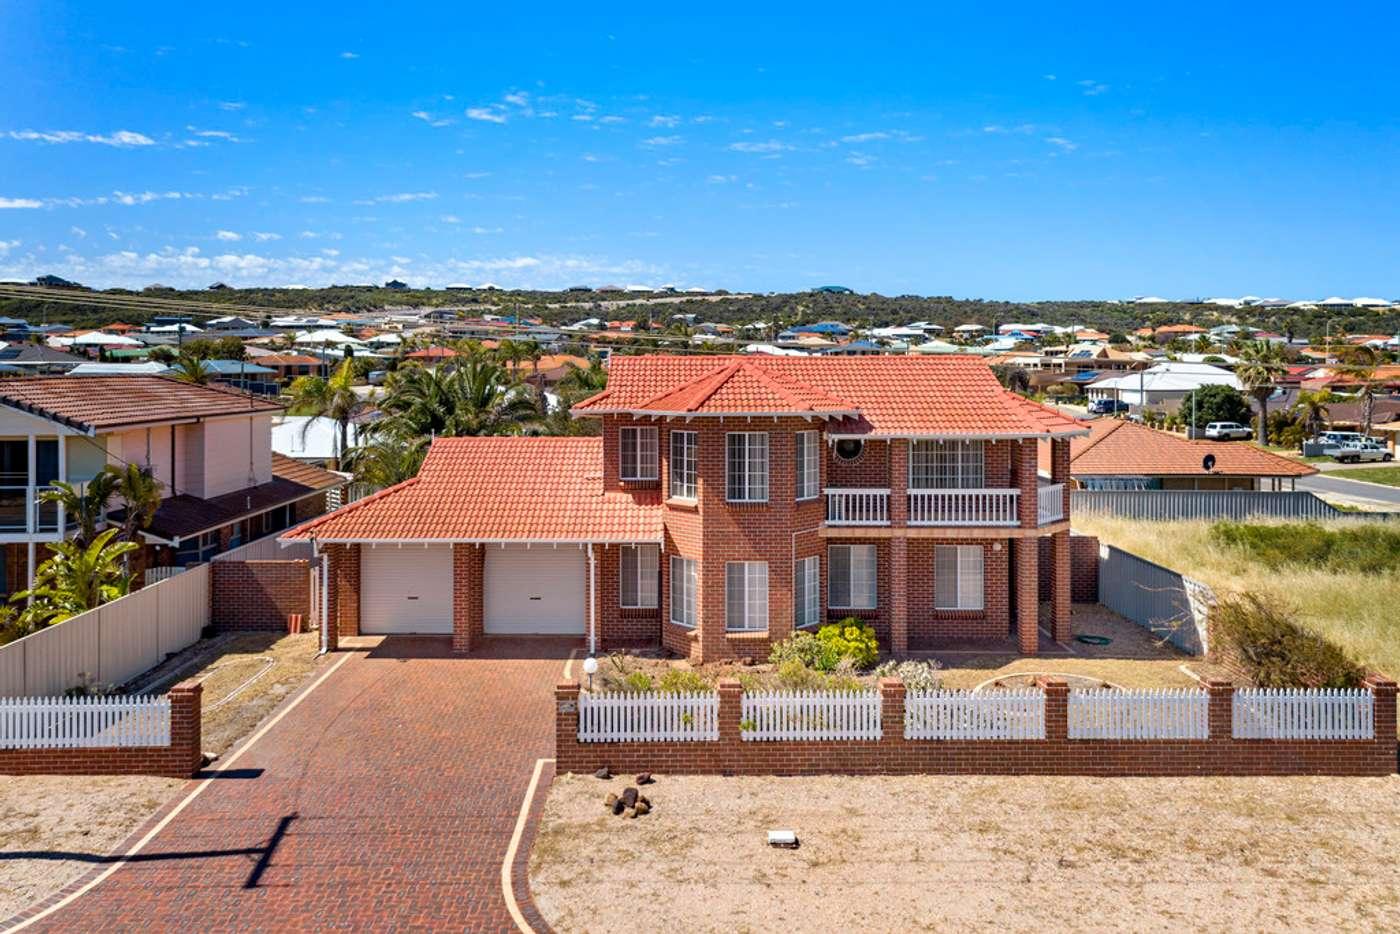 Main view of Homely house listing, 139 Glendinning Road, Tarcoola Beach WA 6530